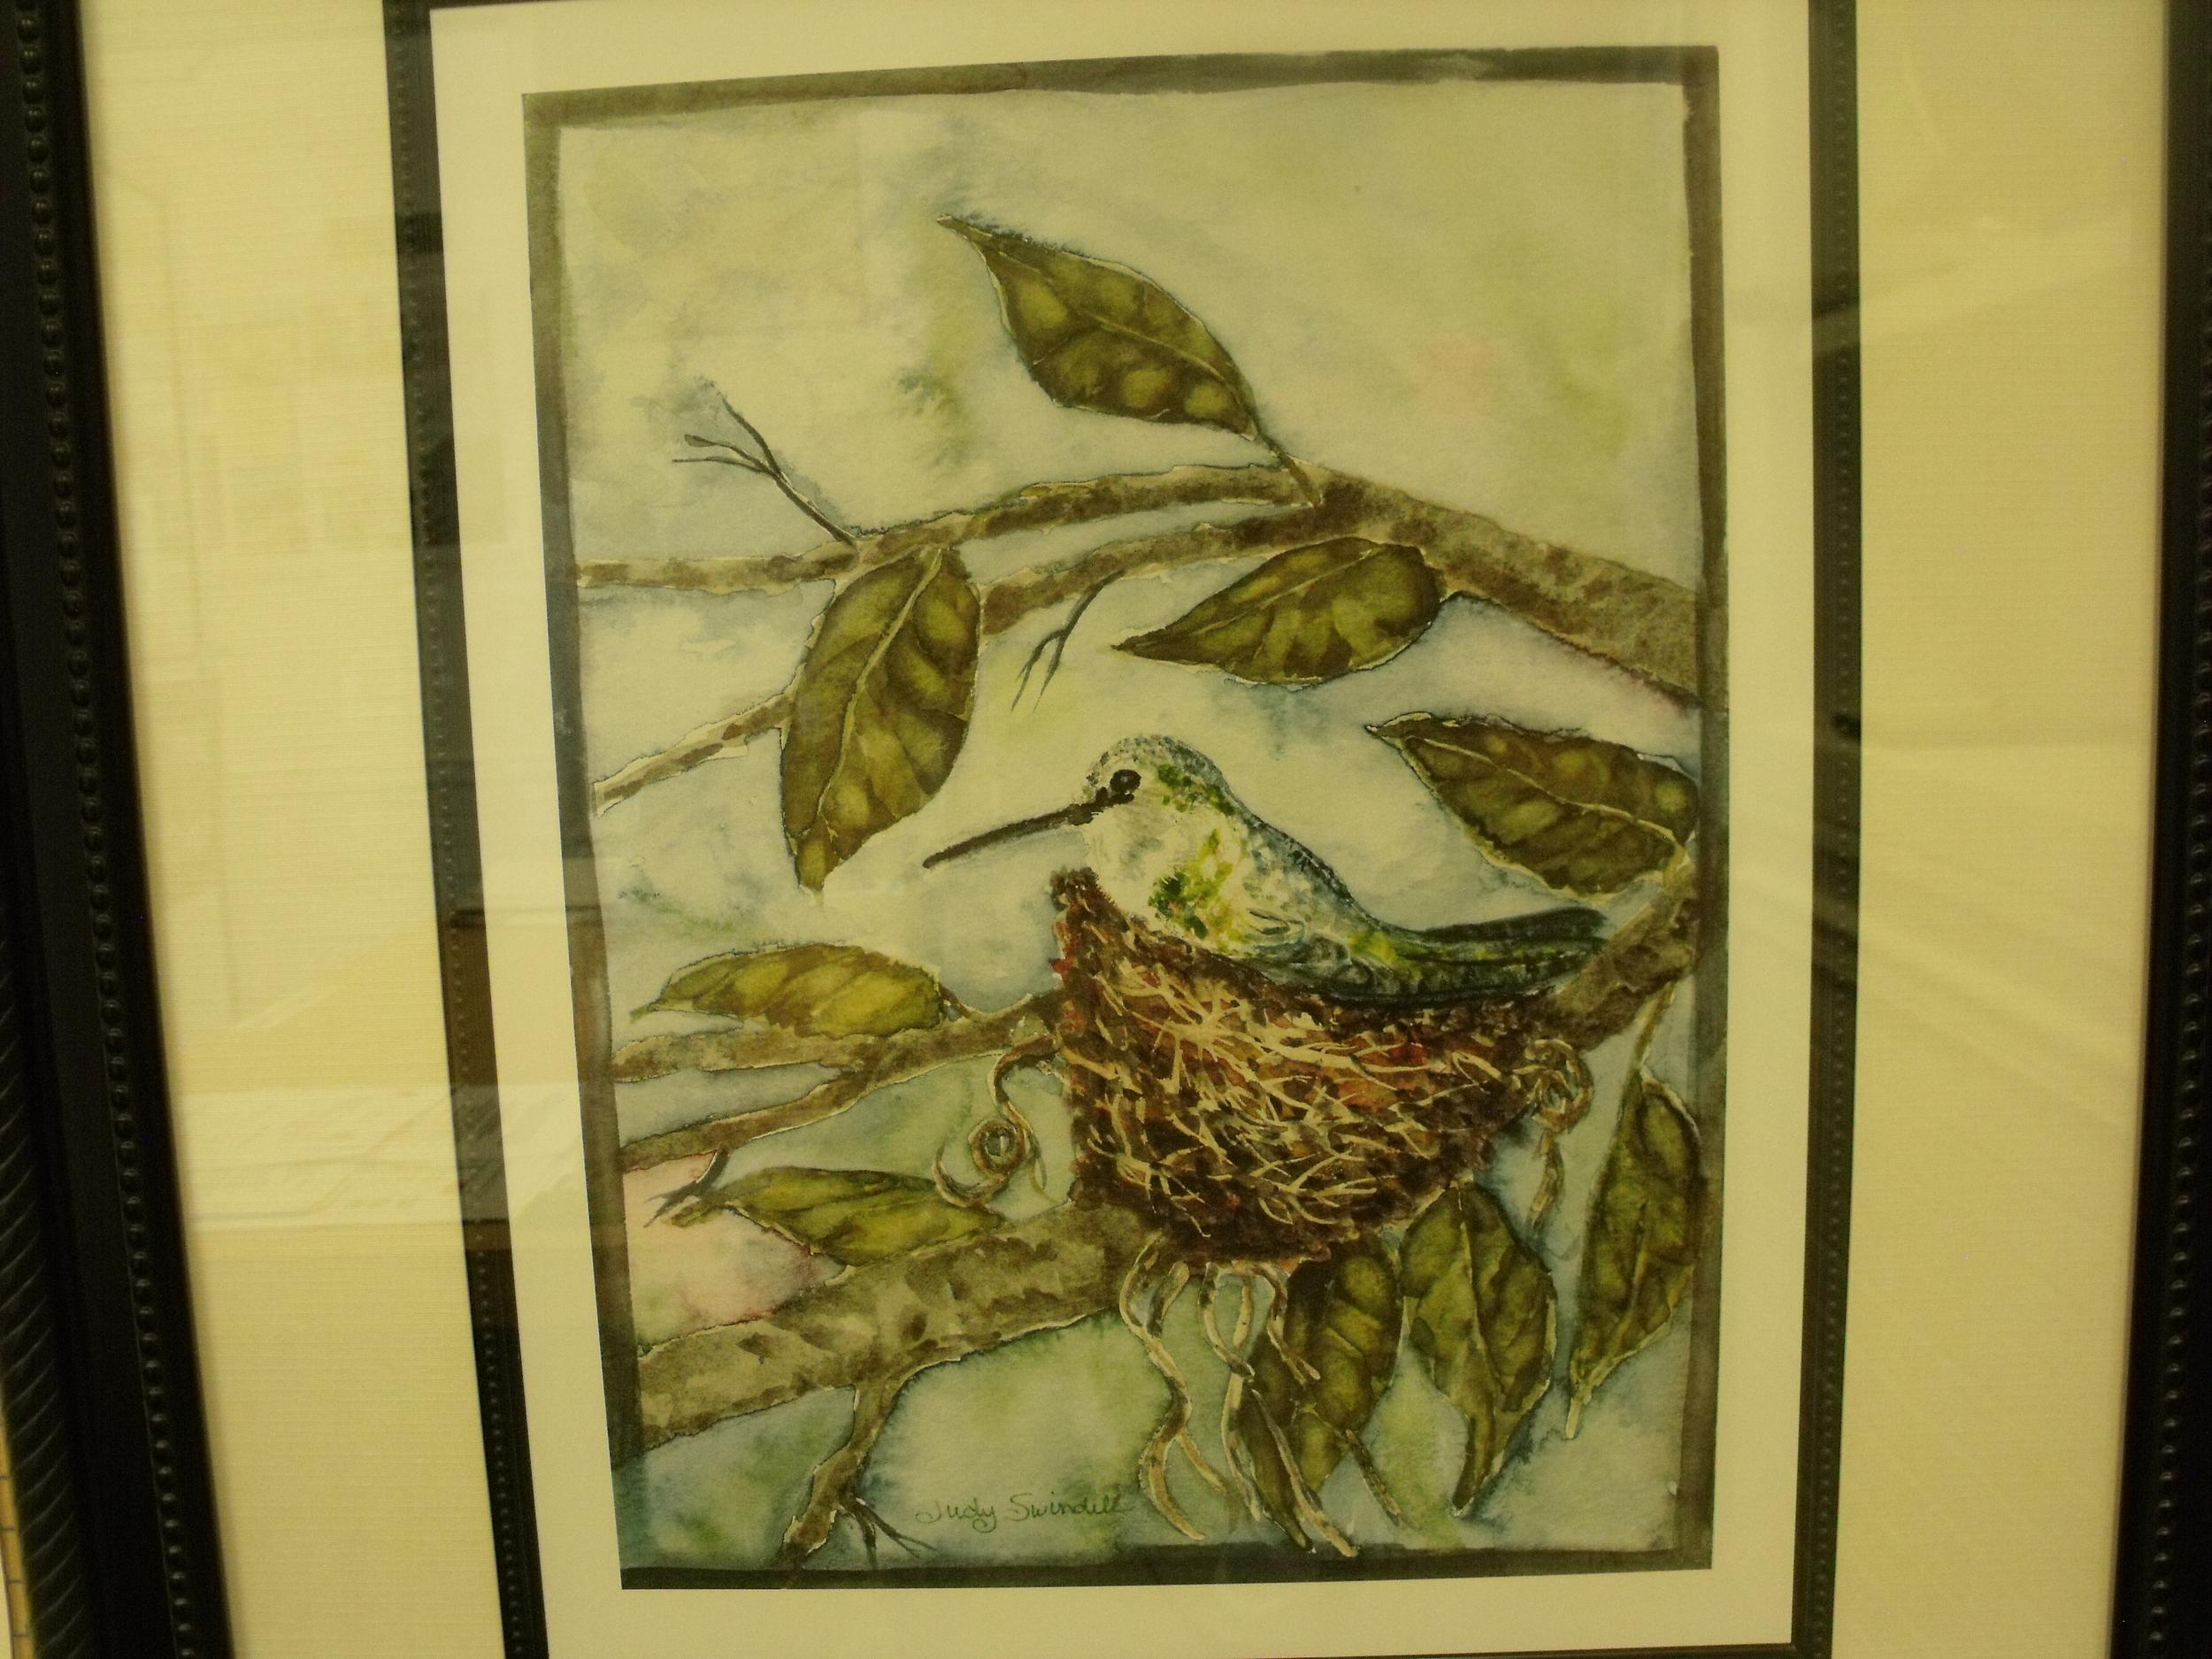 Keeping the Nest by Judy Swindell  $125